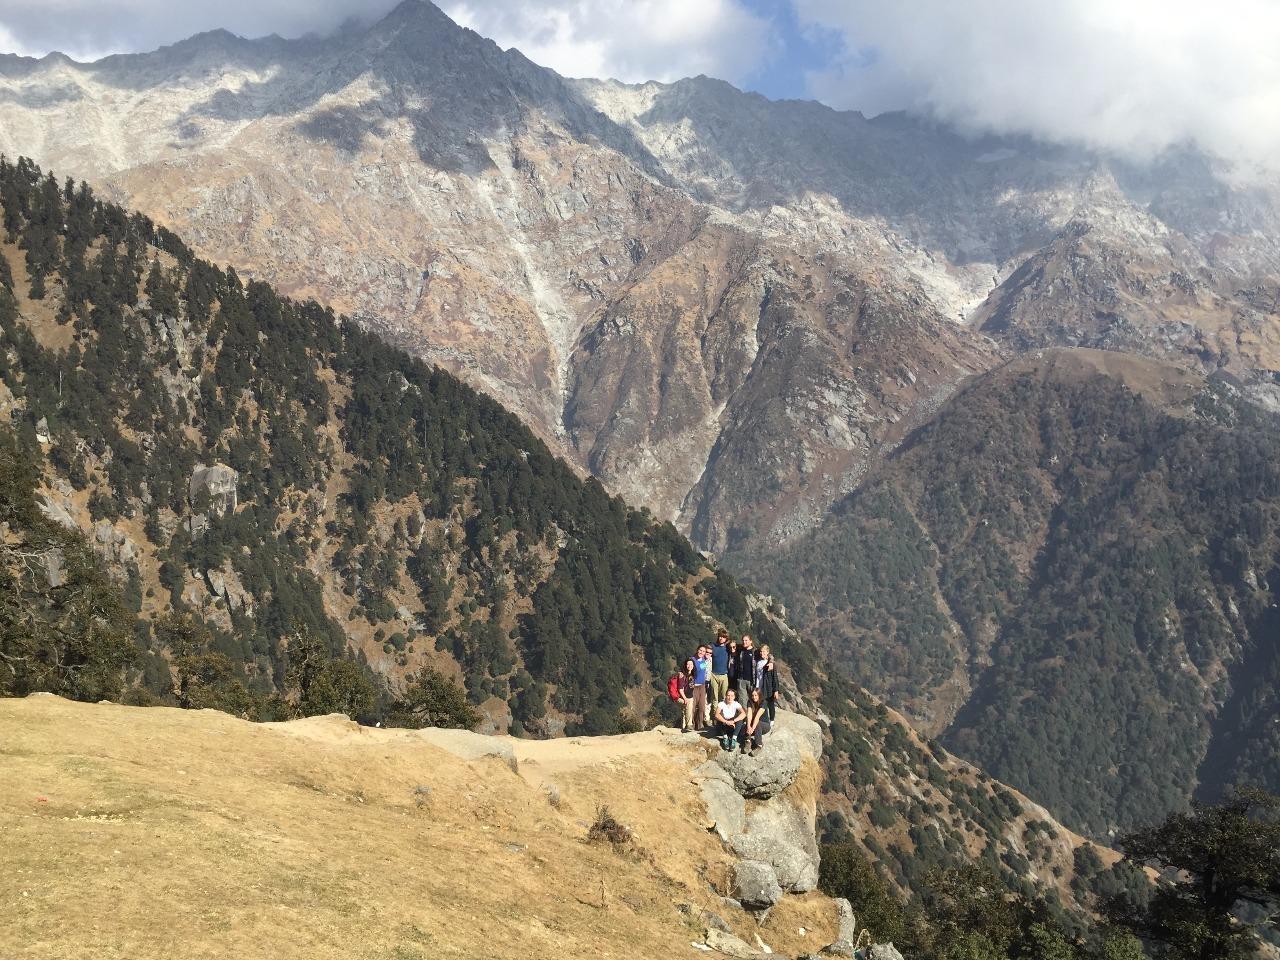 The team on Himalayan day hike above Dharamsala.